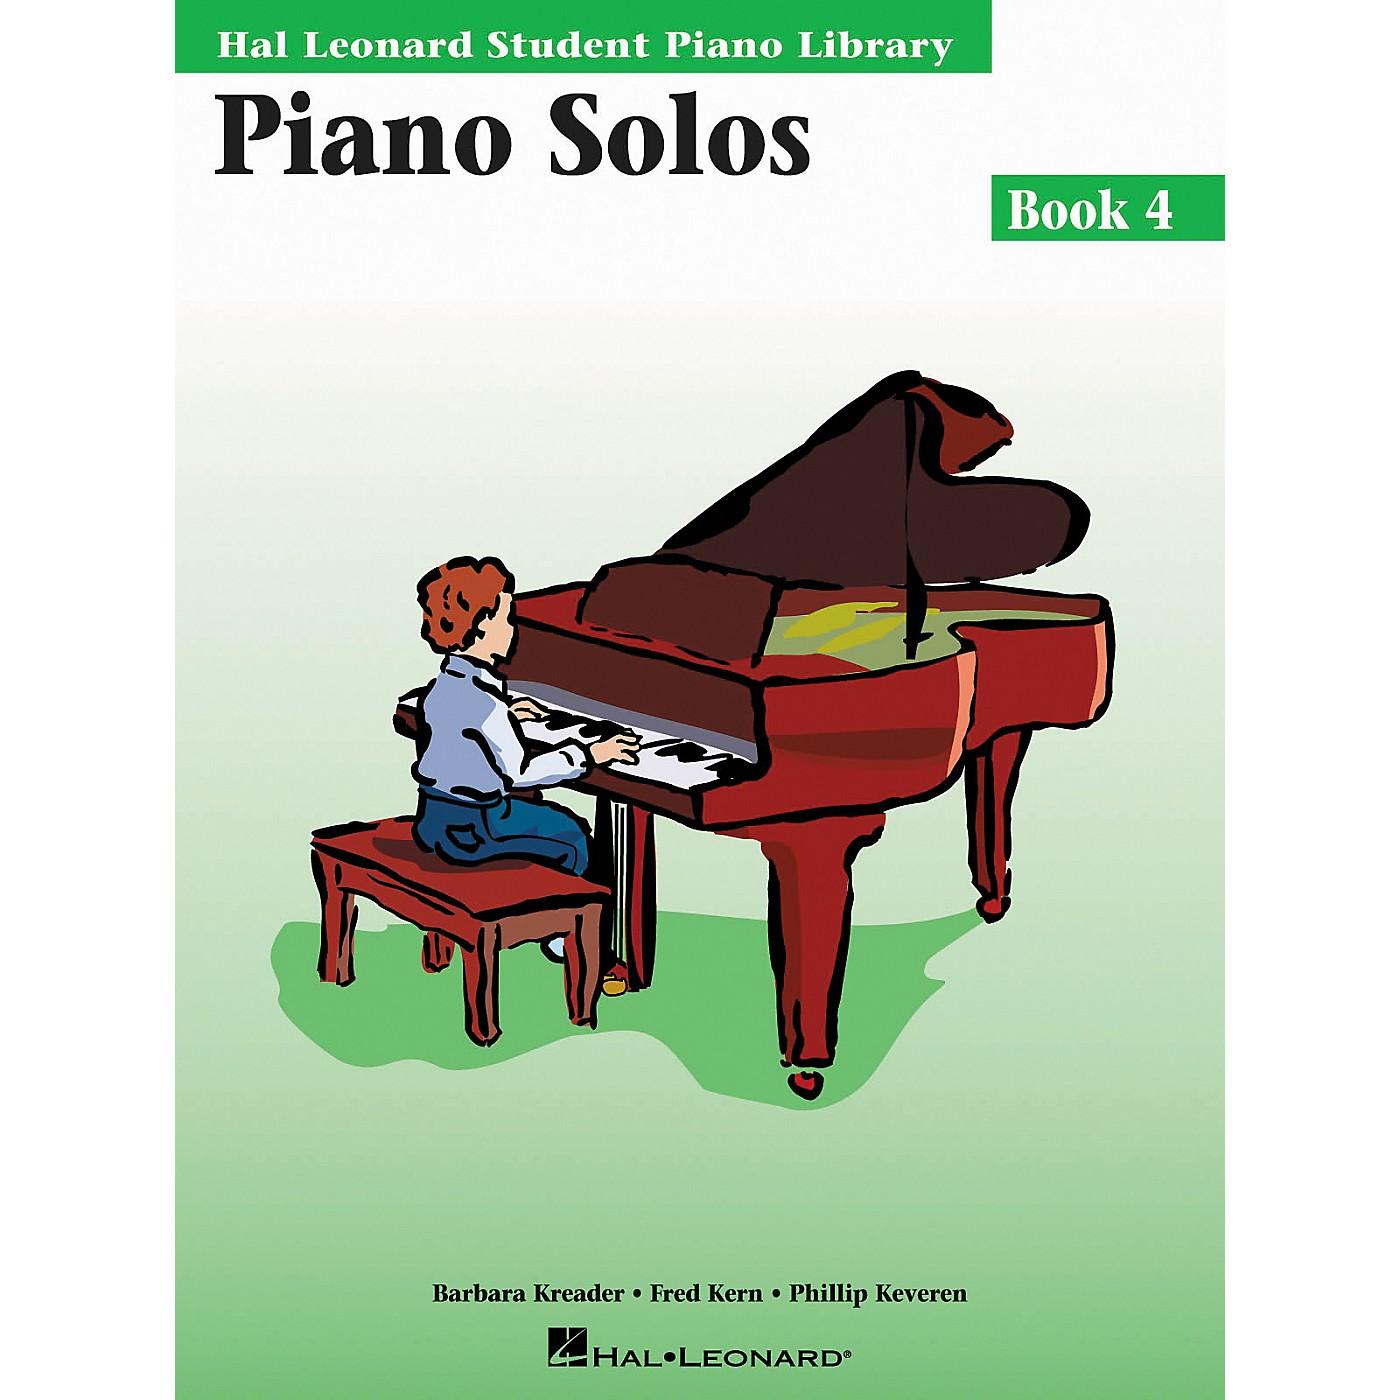 Hal Leonard Piano Solos Book 4 Hal Leonard Student Piano Library thumbnail